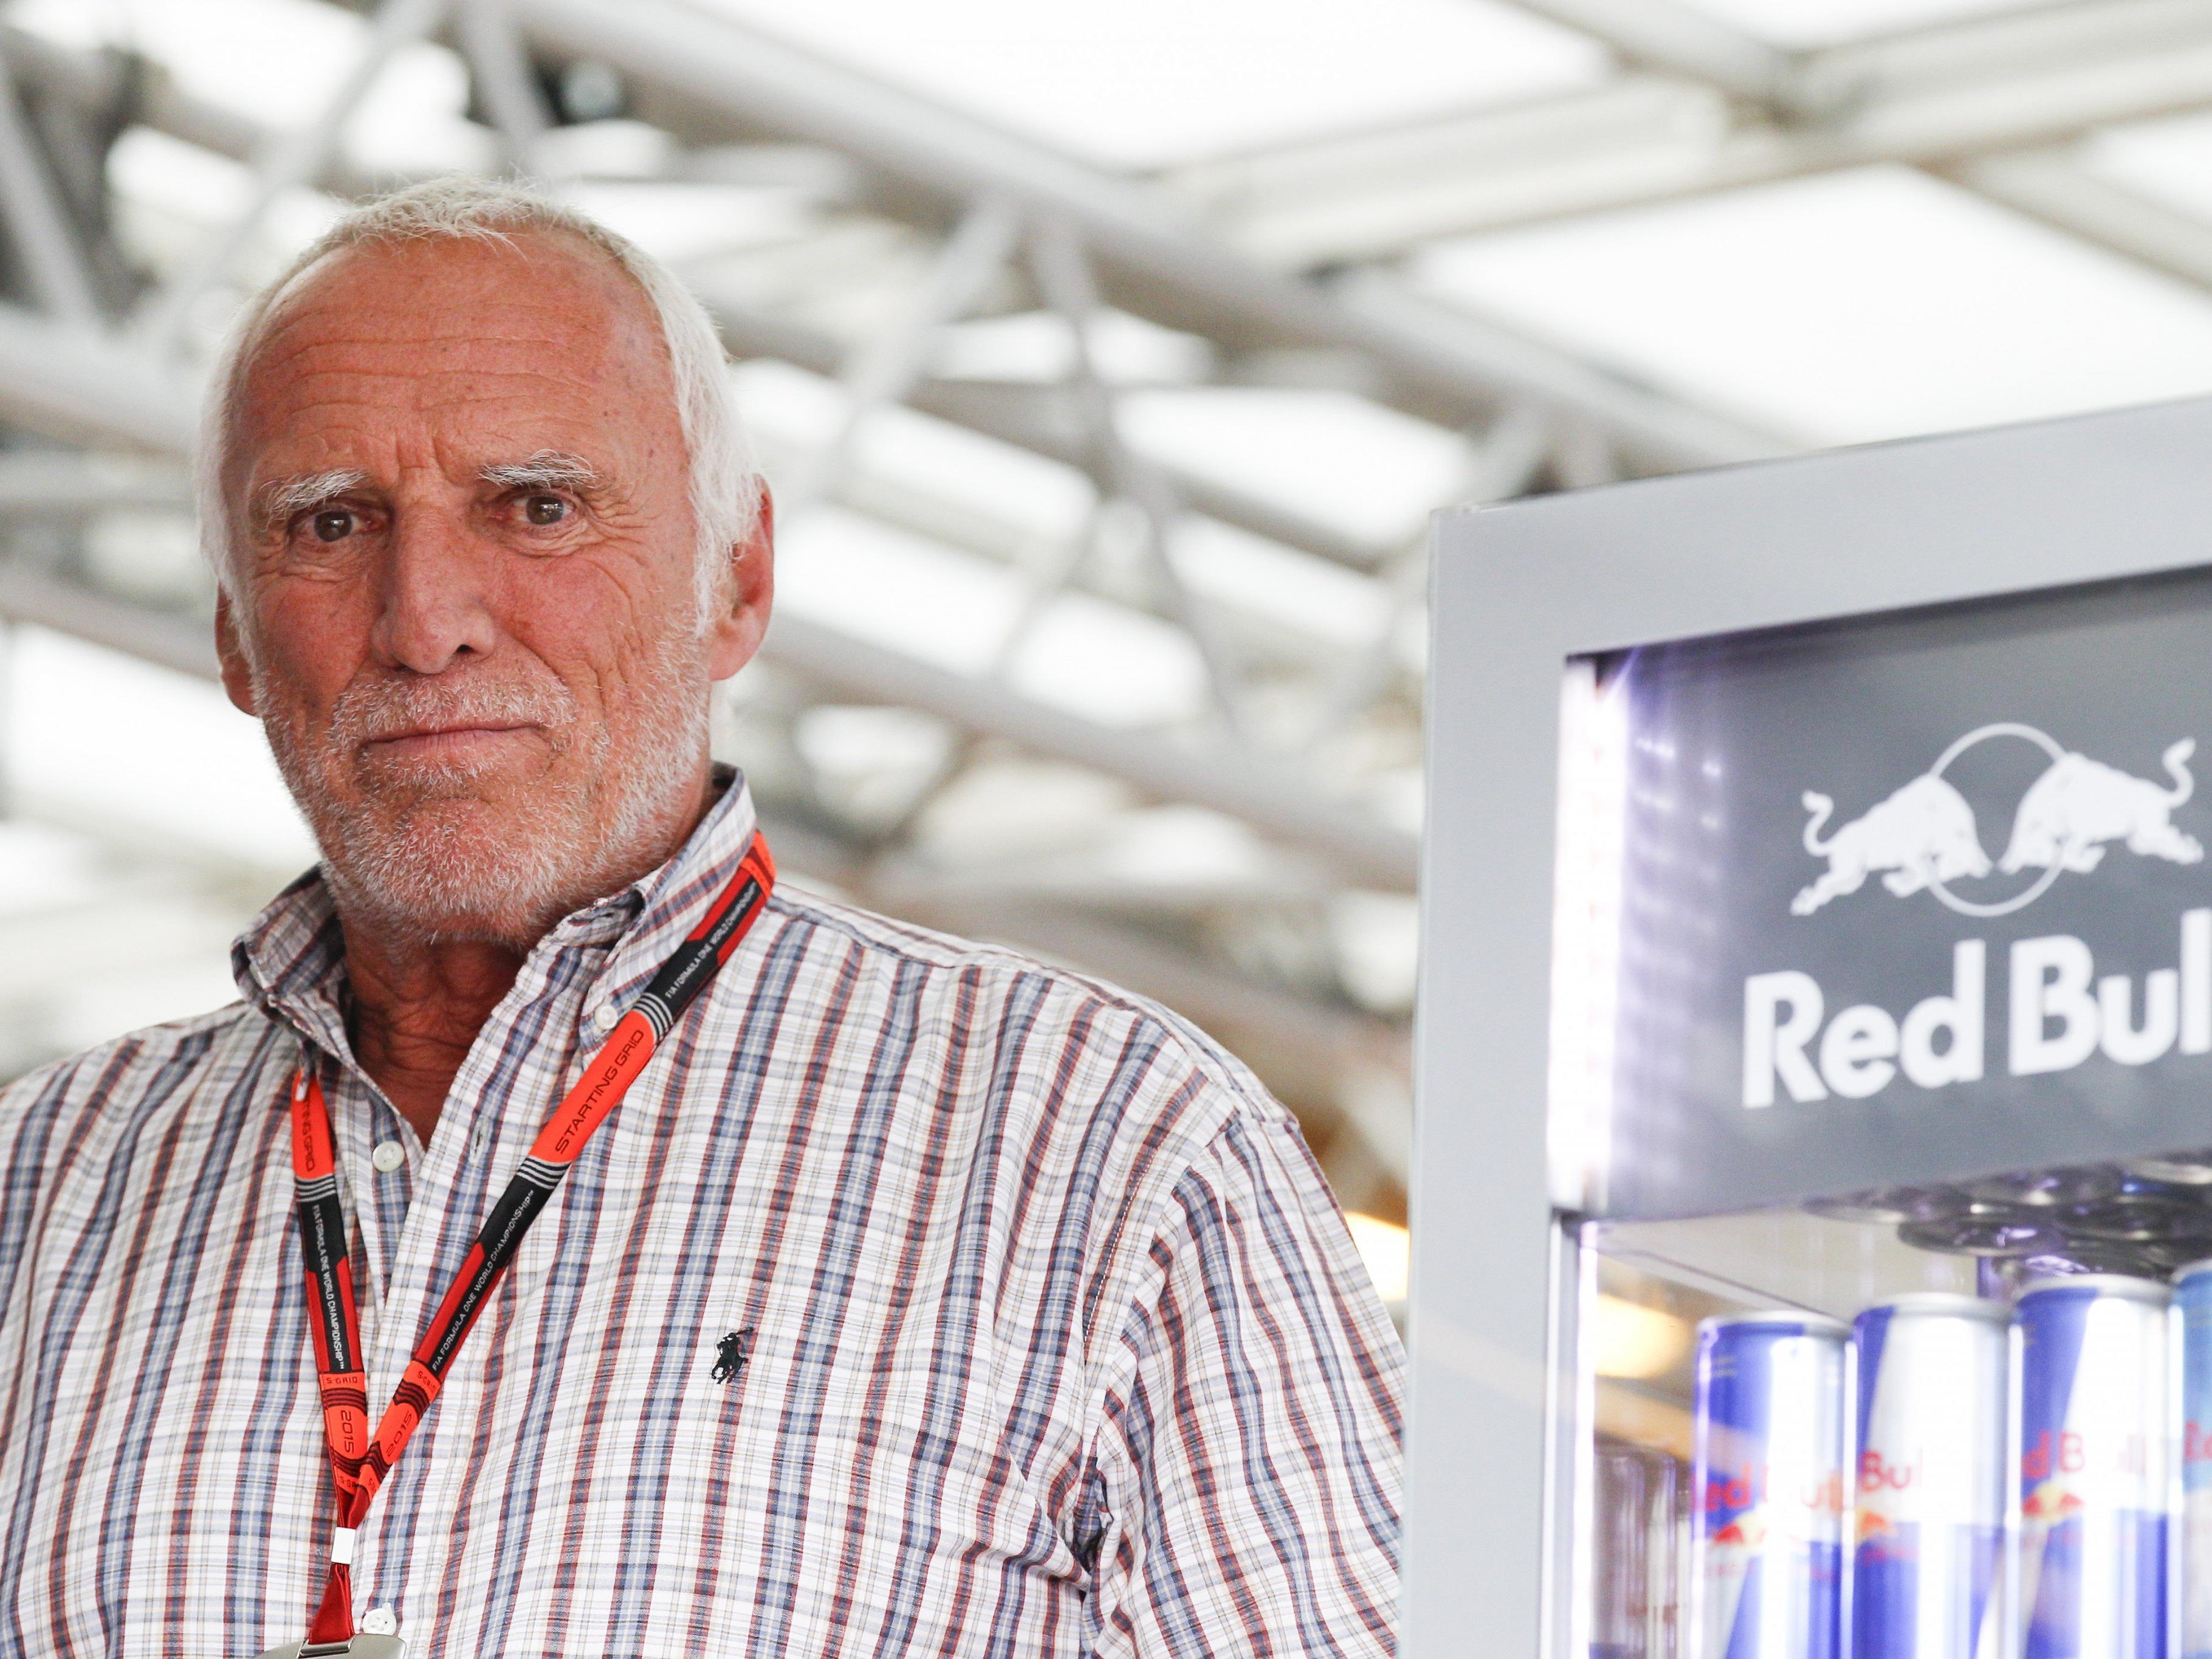 Scharfe Kritik von AK und GPA an Mateschitz-Sager - den Rücken bekommt der Red-Bull-Chef dennoch gestärkt.